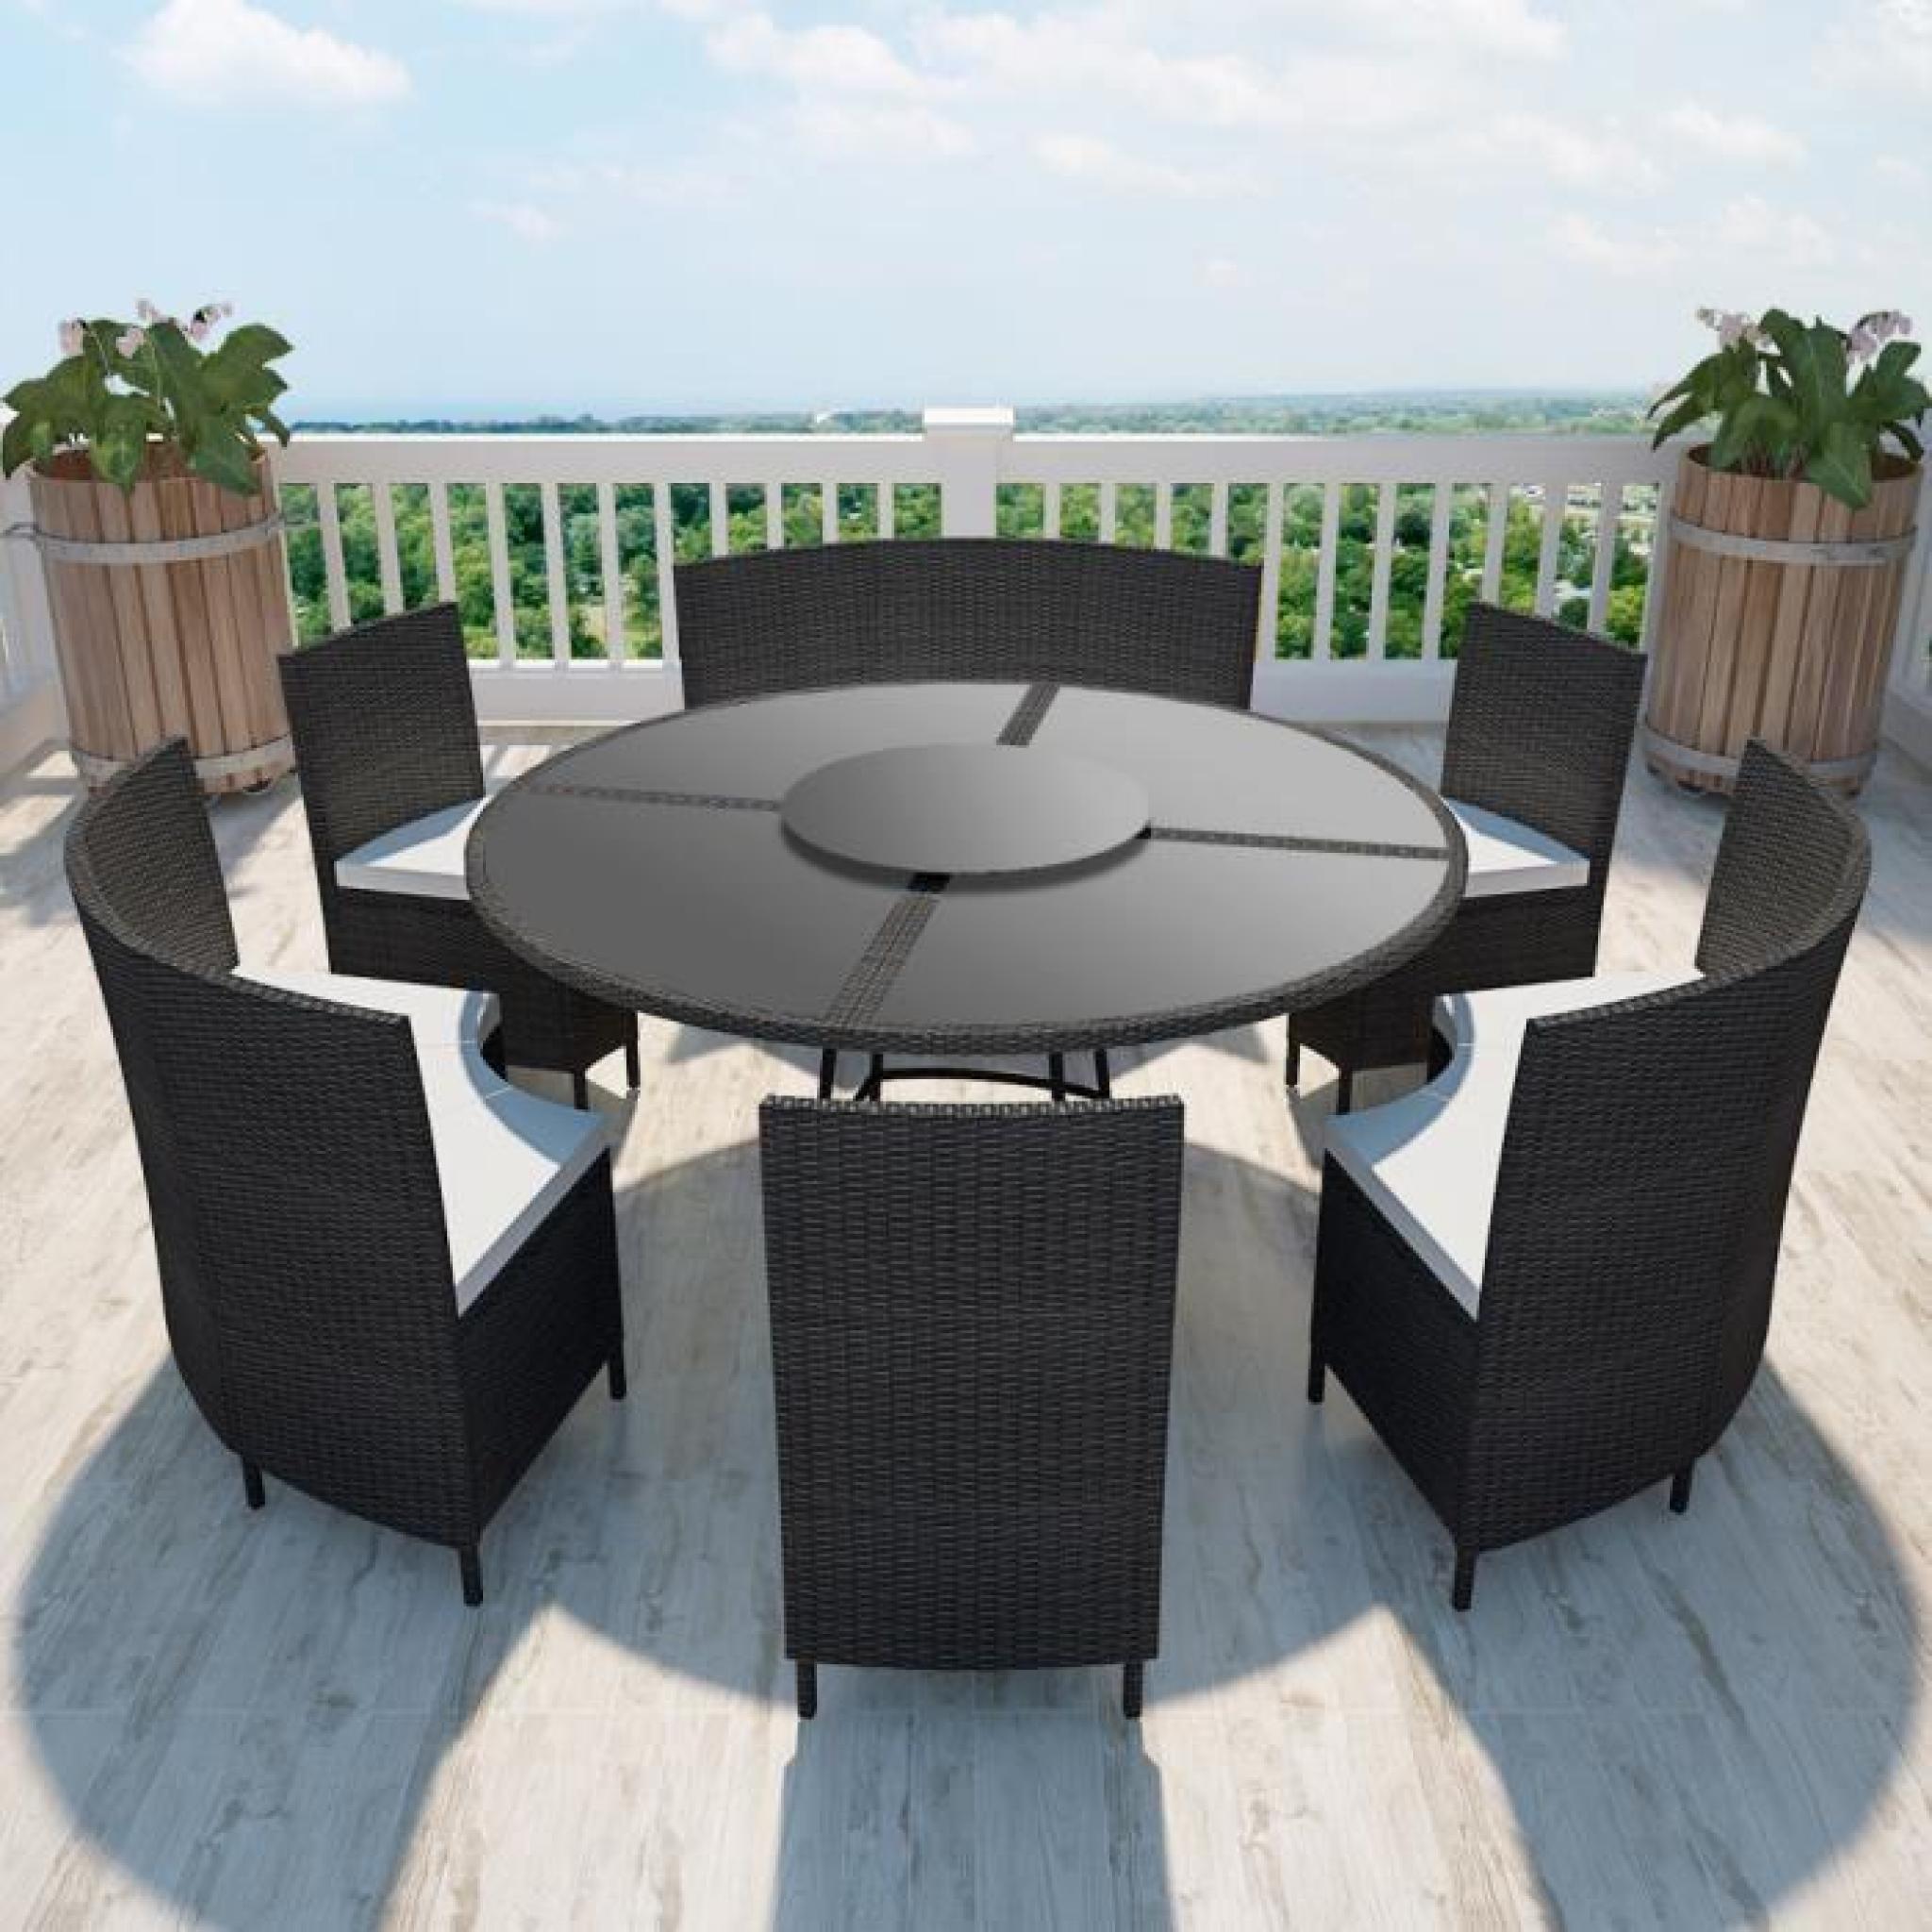 Salon De Jardin Noir En Polyrotin Table Ronde Et Chaises 12 Pers. pour Table Et Chaises De Jardin Pas Cher